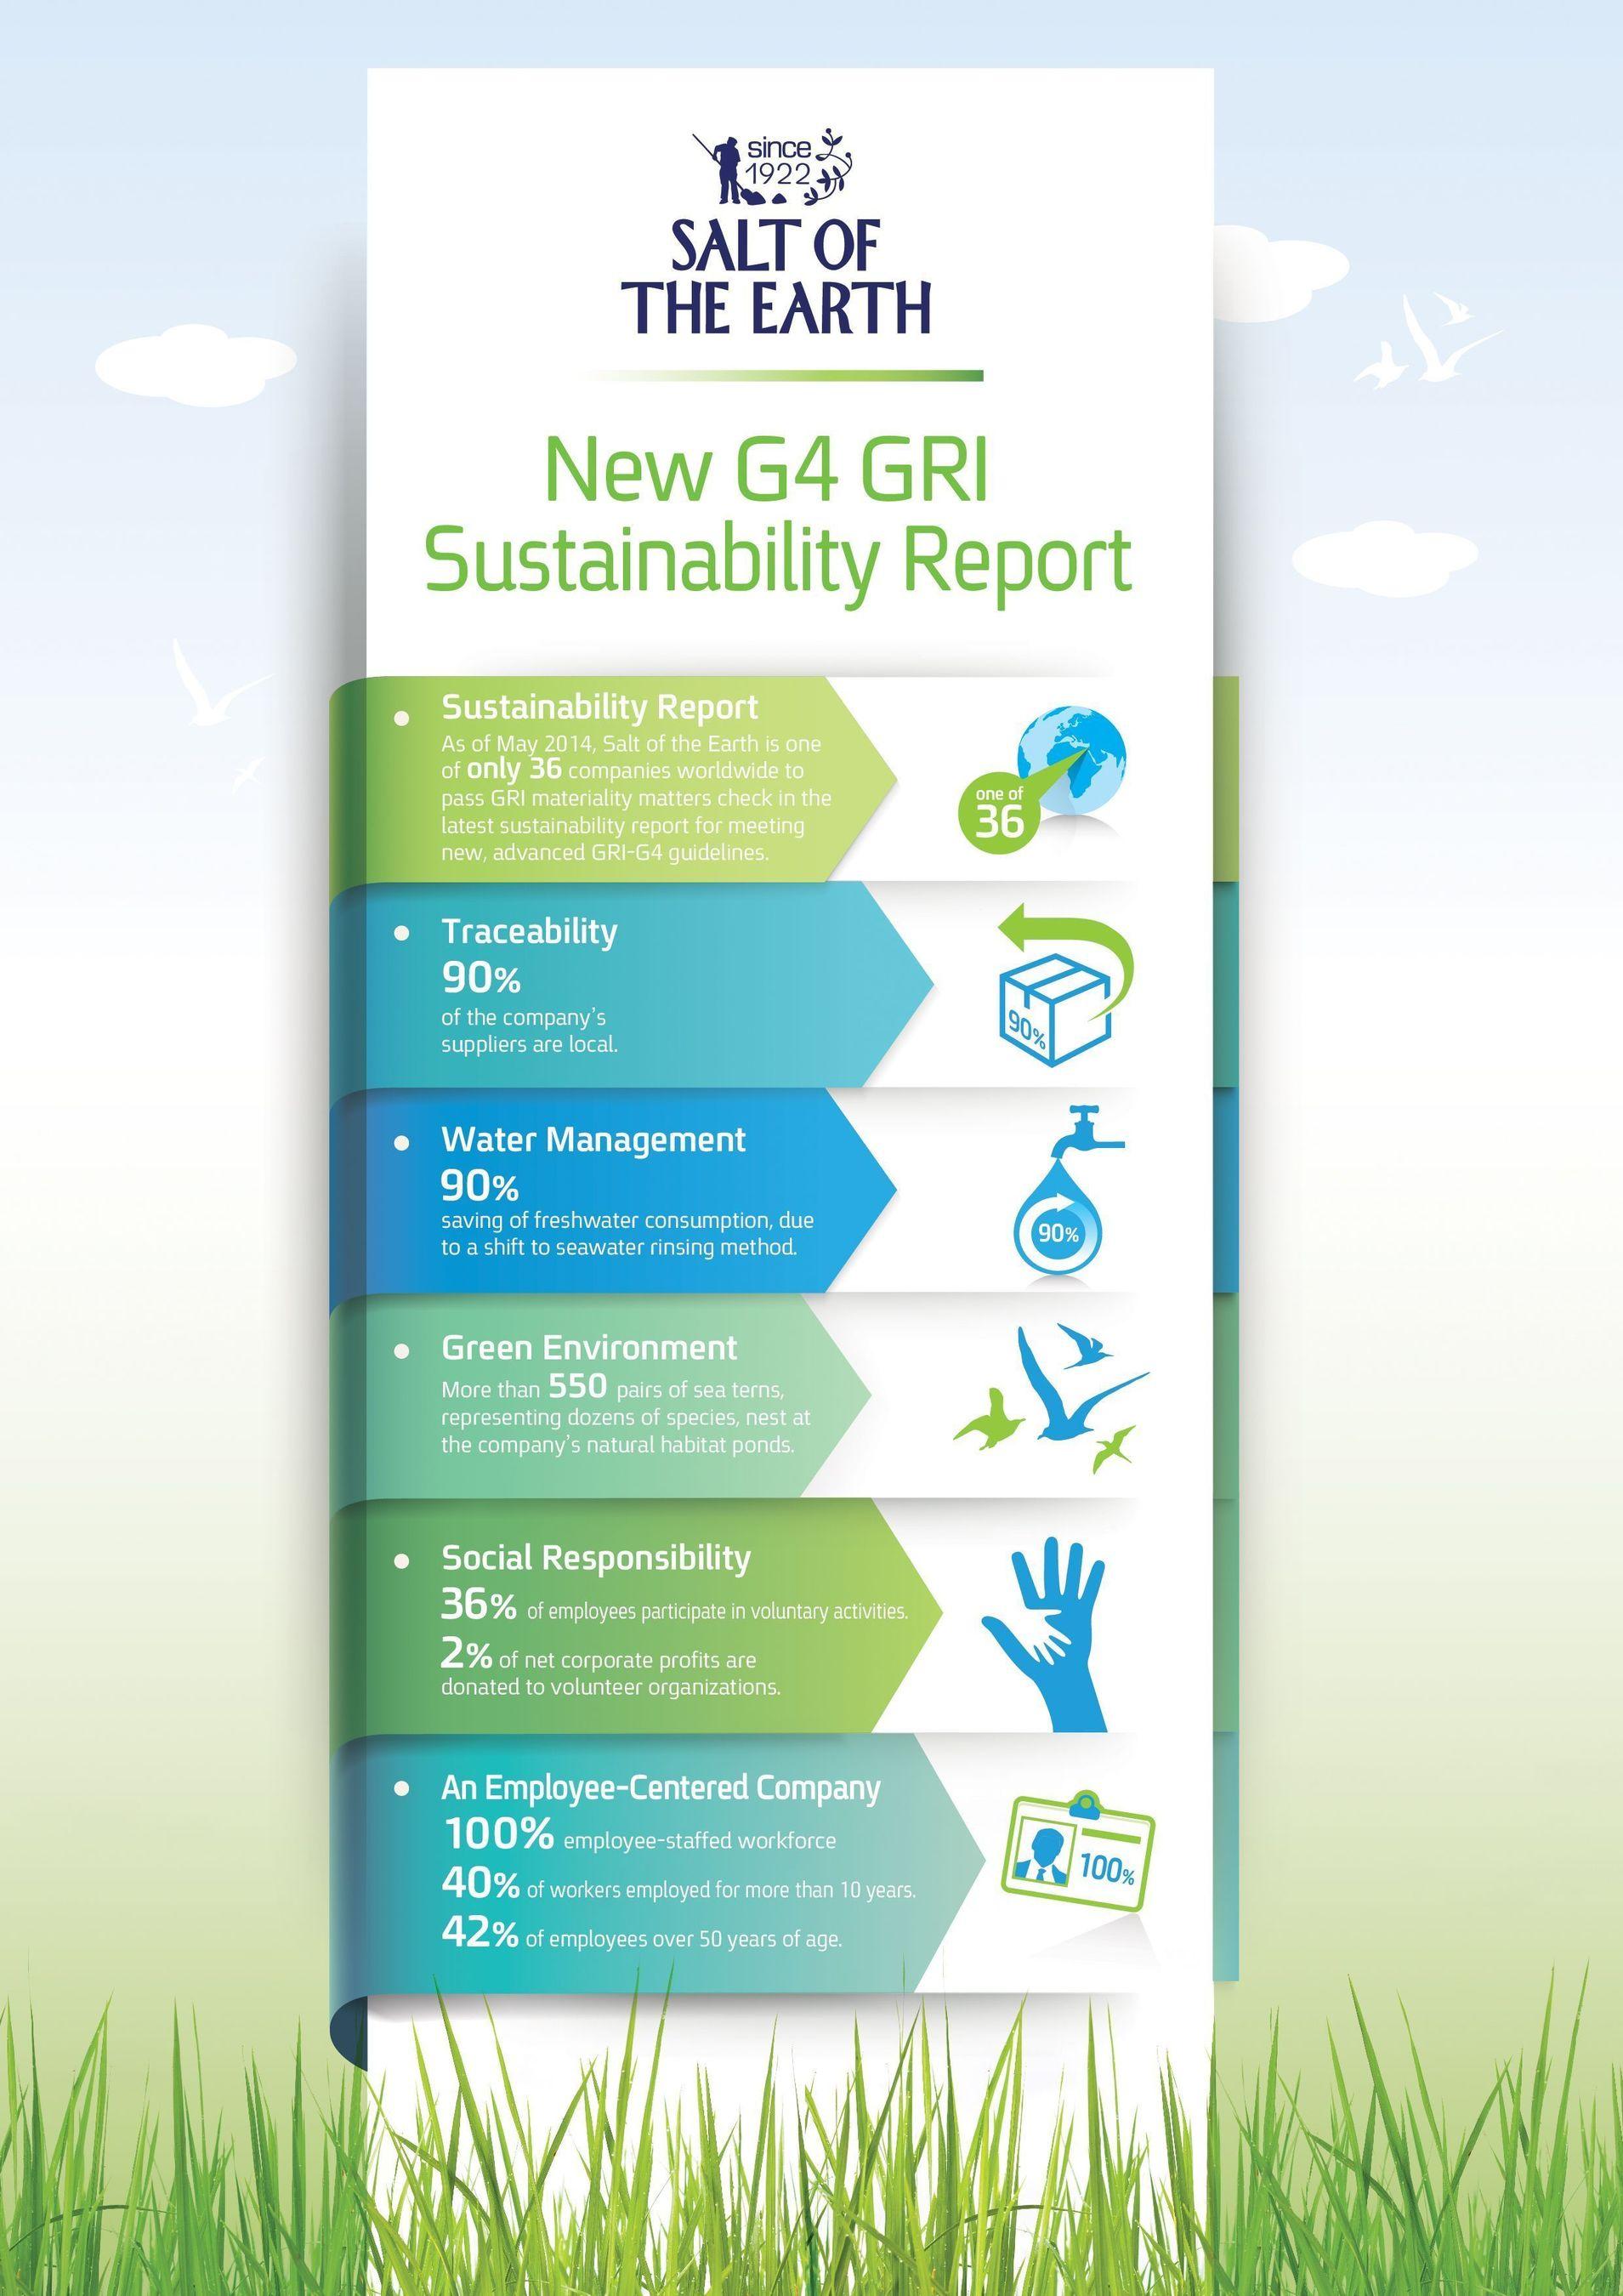 Salt of the Earth Reveals New GRI Sustainability Report (PRNewsFoto/Salt of the Earth Ltd)